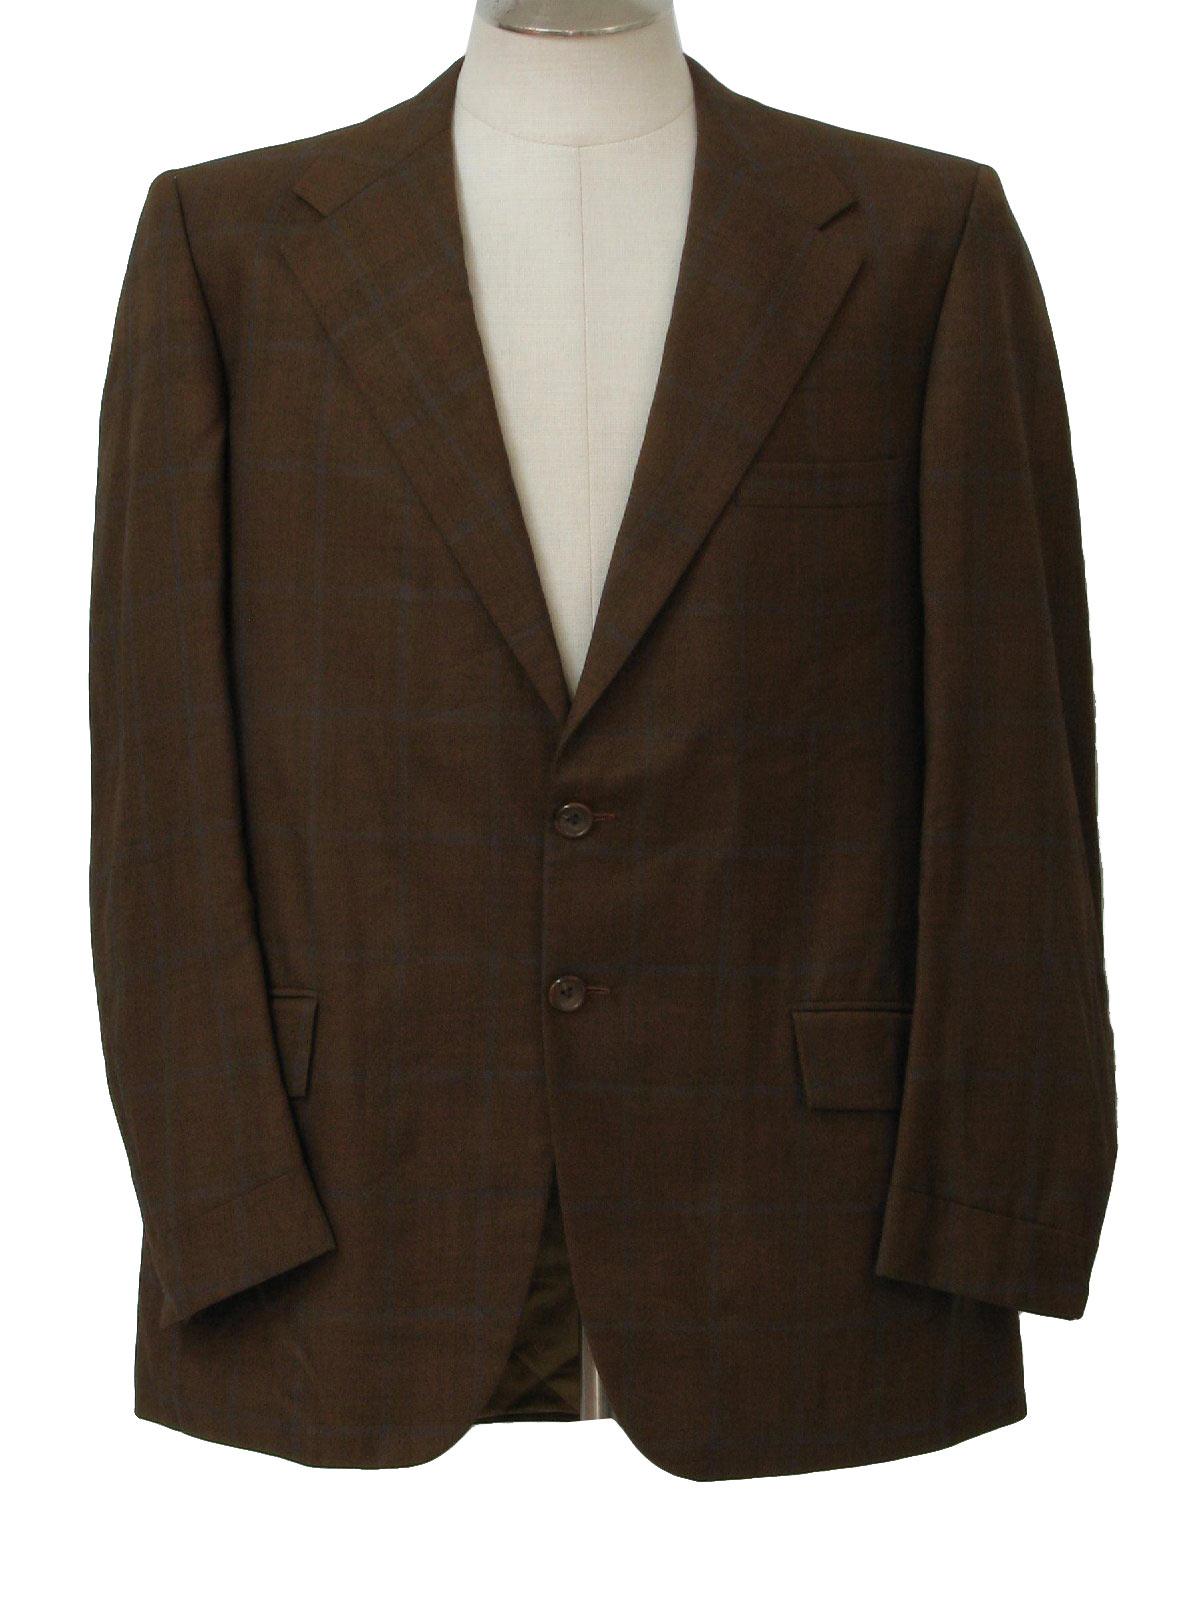 Vintage 70s Jacket: 70s -Louis Roth- Mens brown, rust and grey